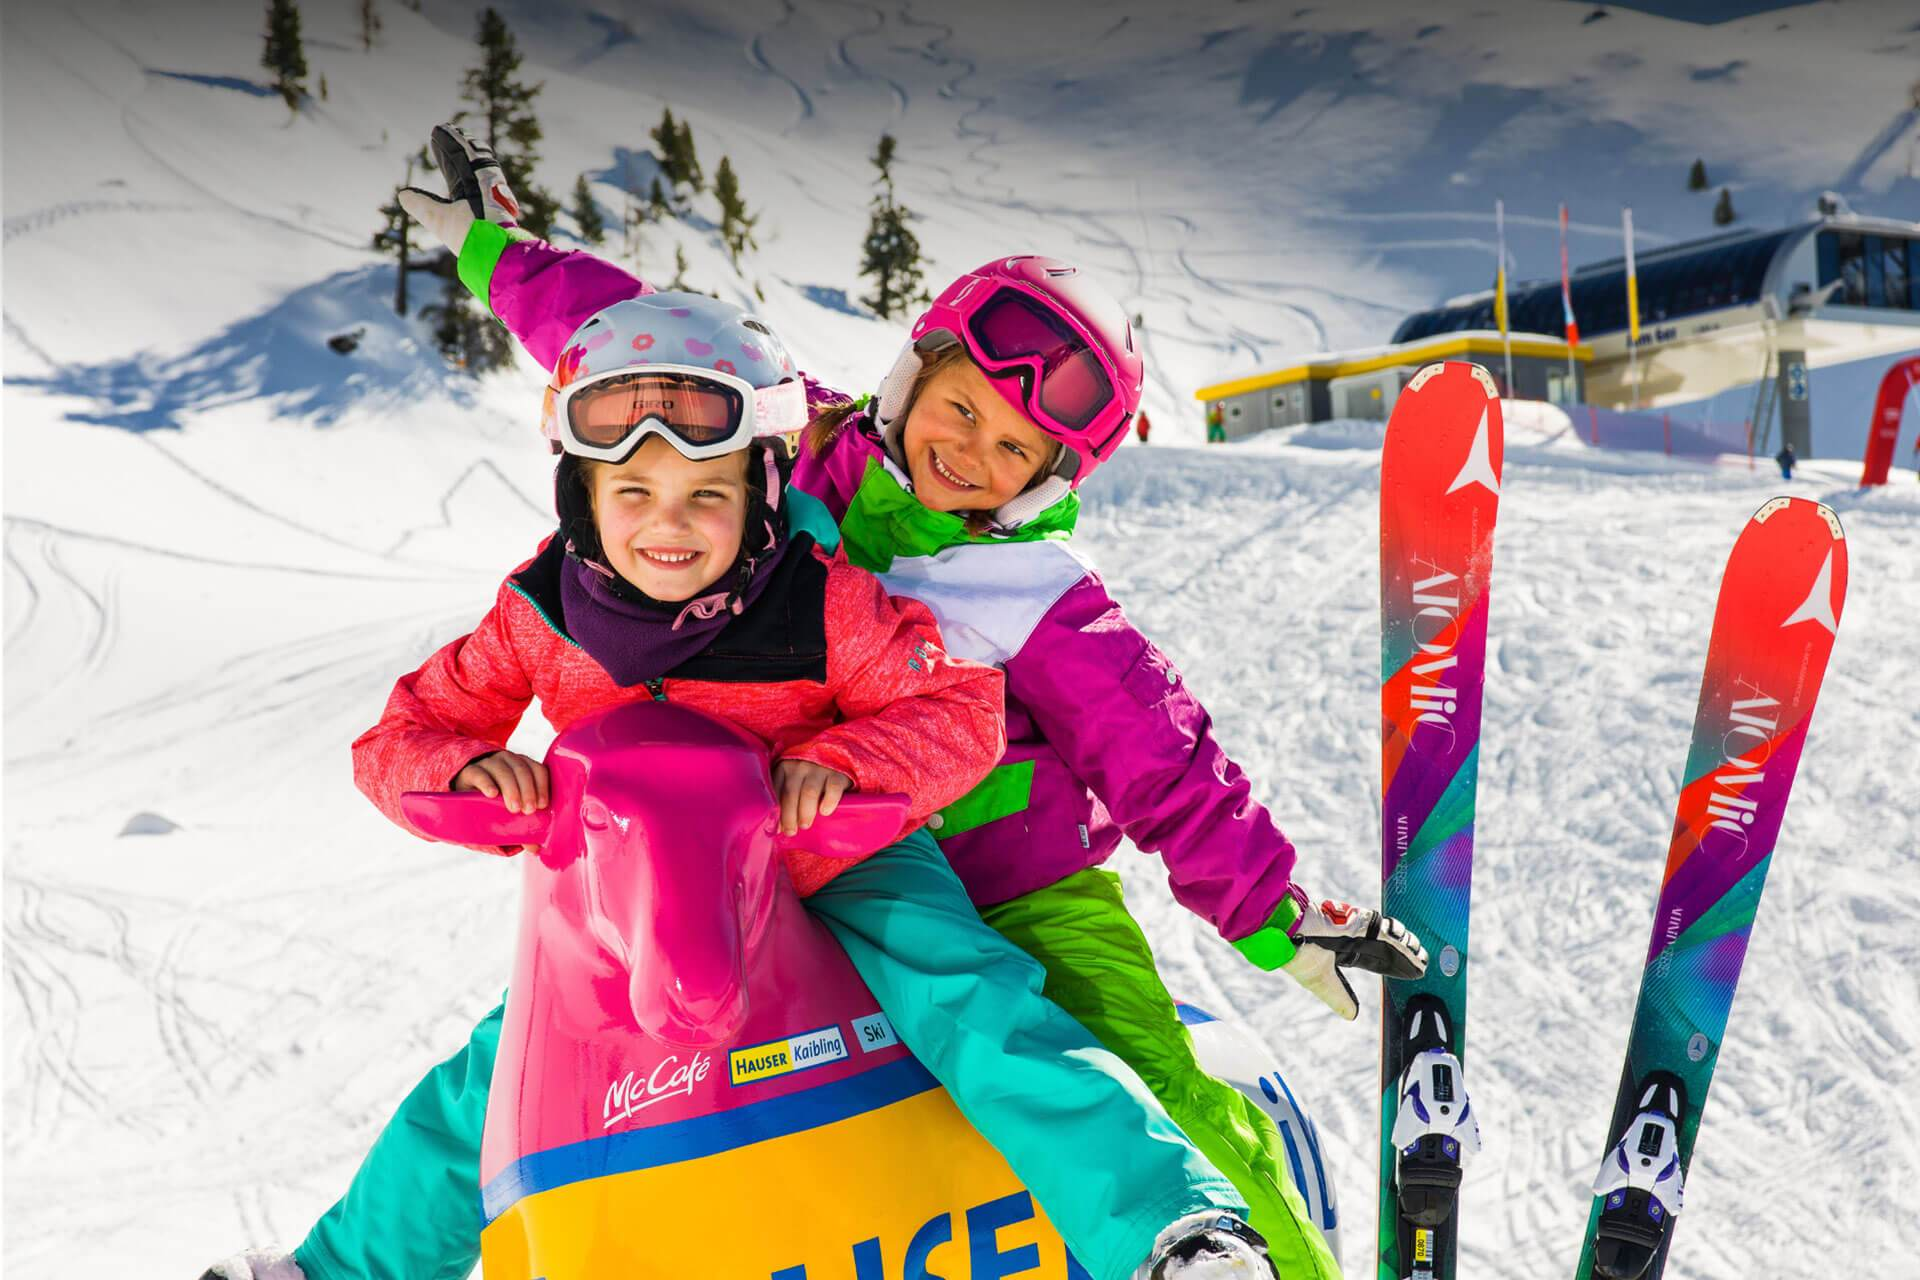 Skiurlaub am Hauser Kaibling, Steiermark